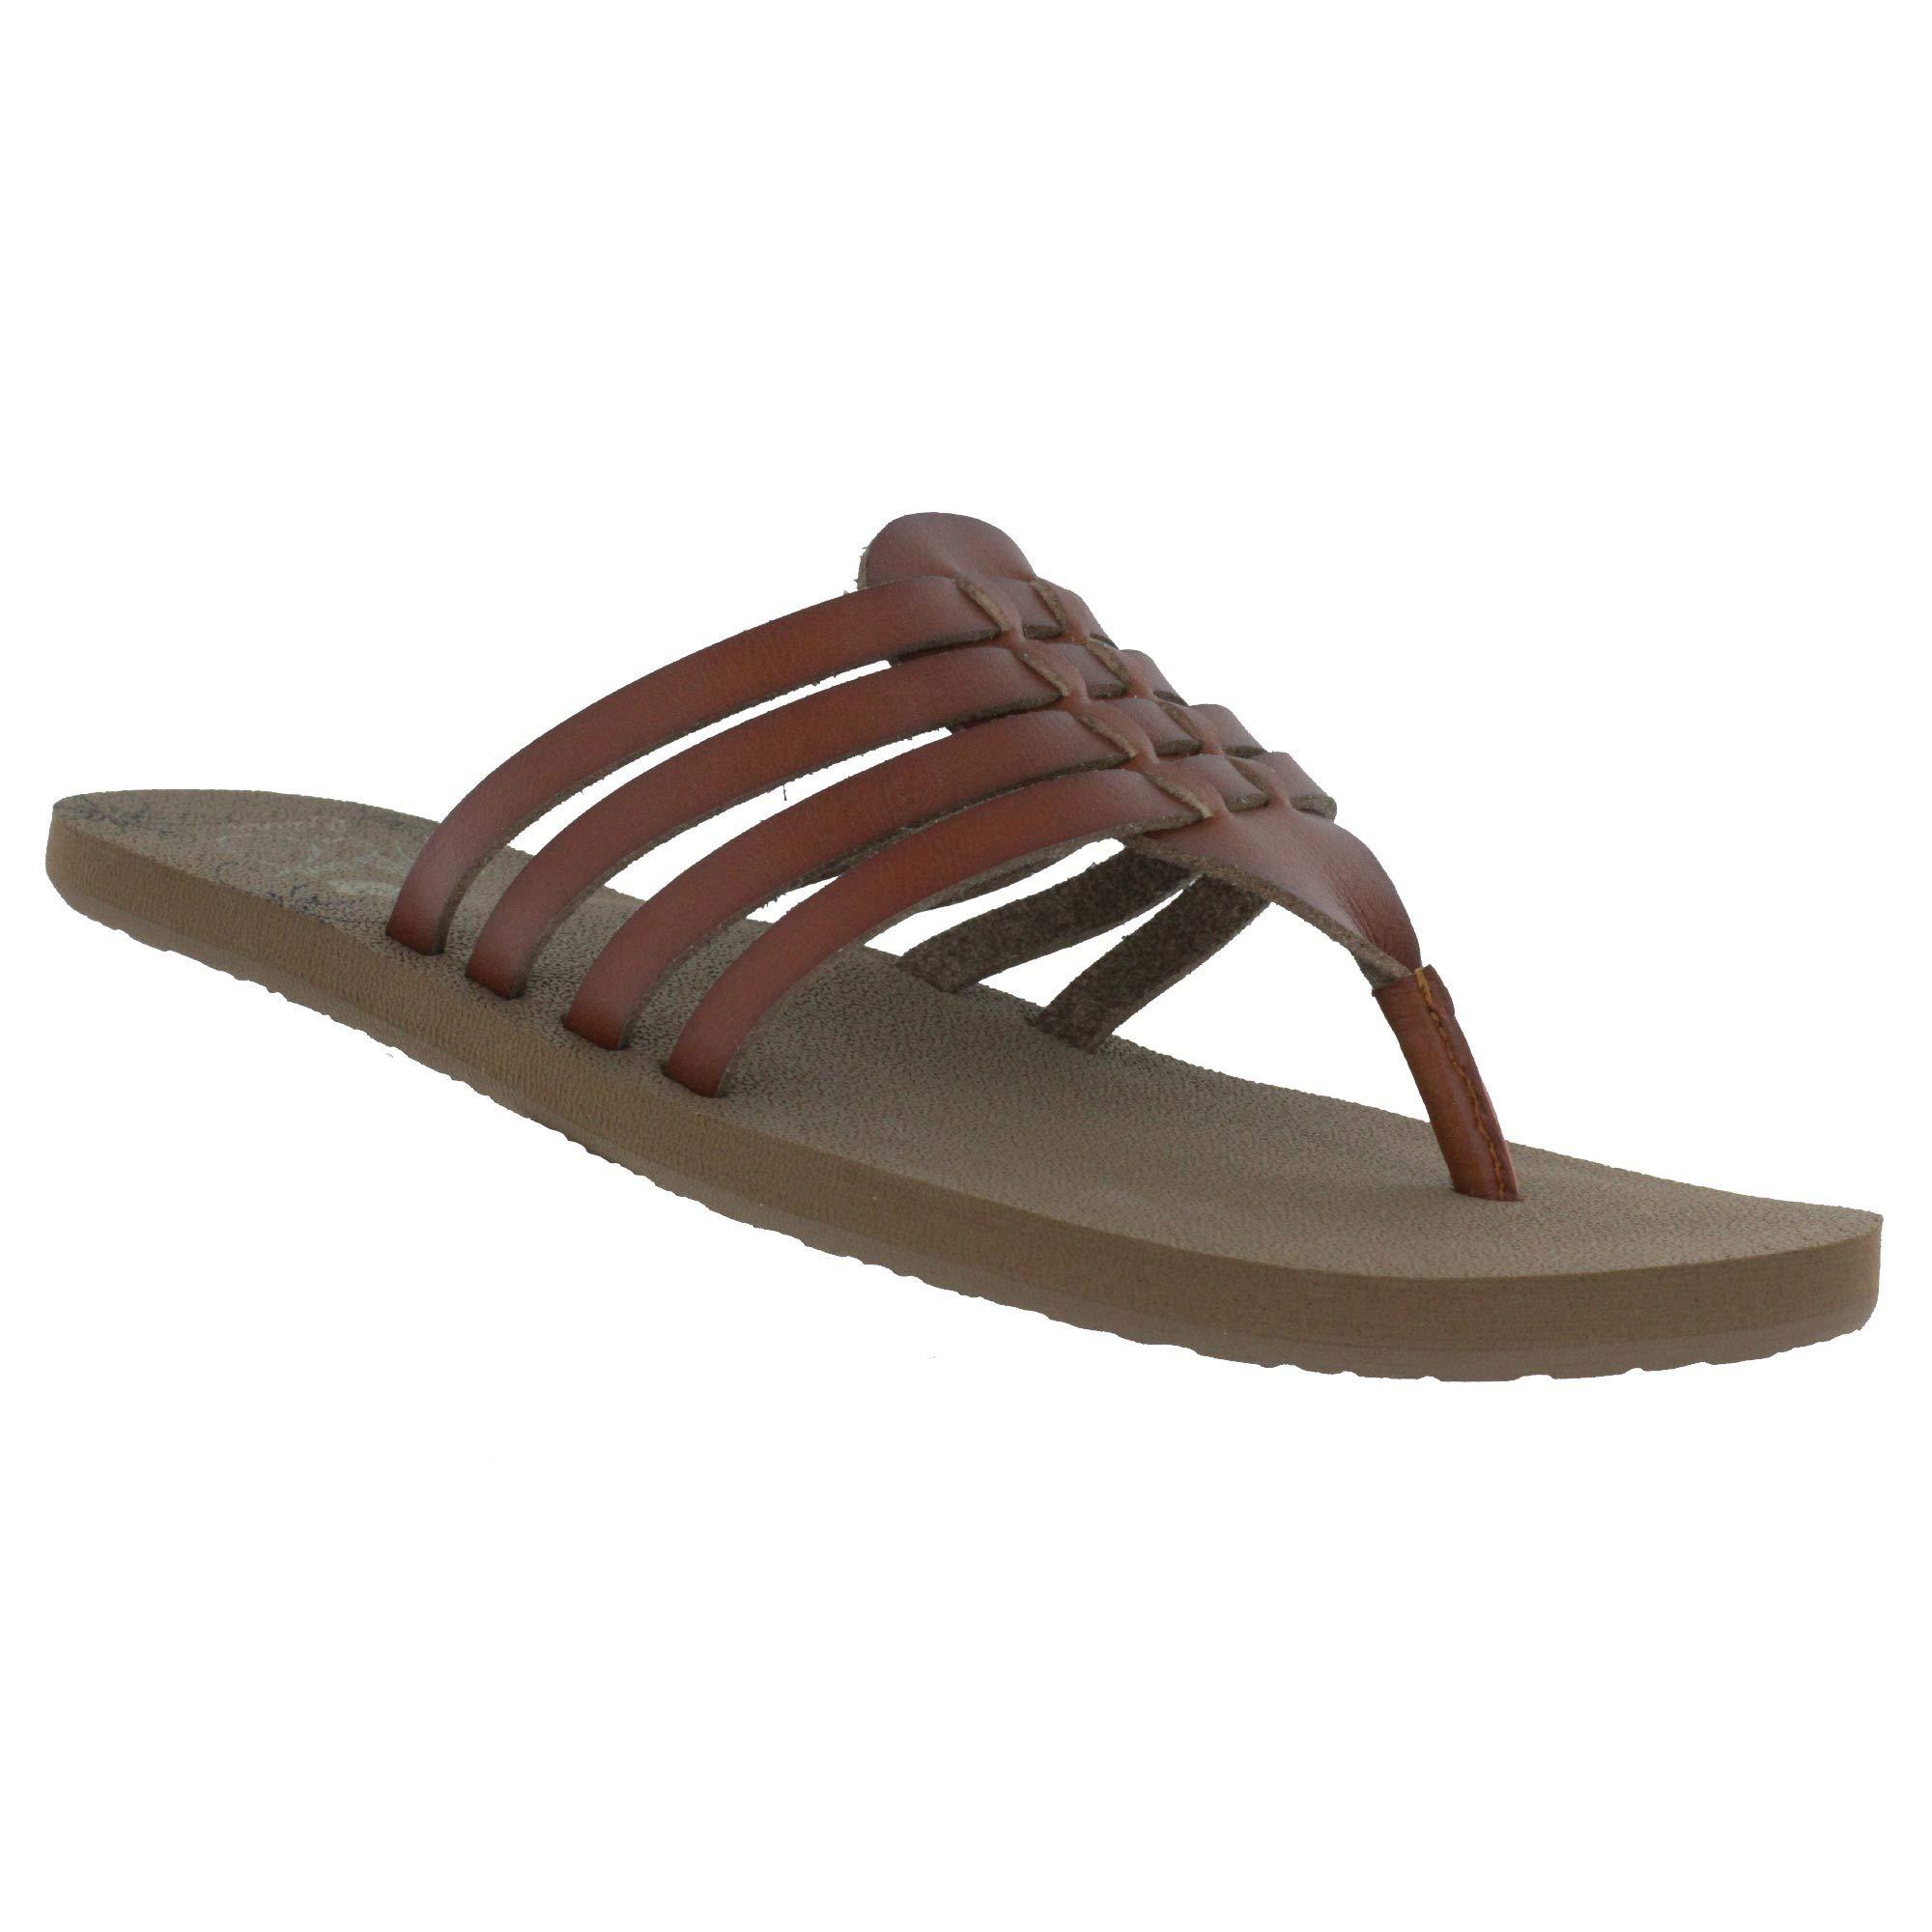 Cobian Women's Aloha Sandals